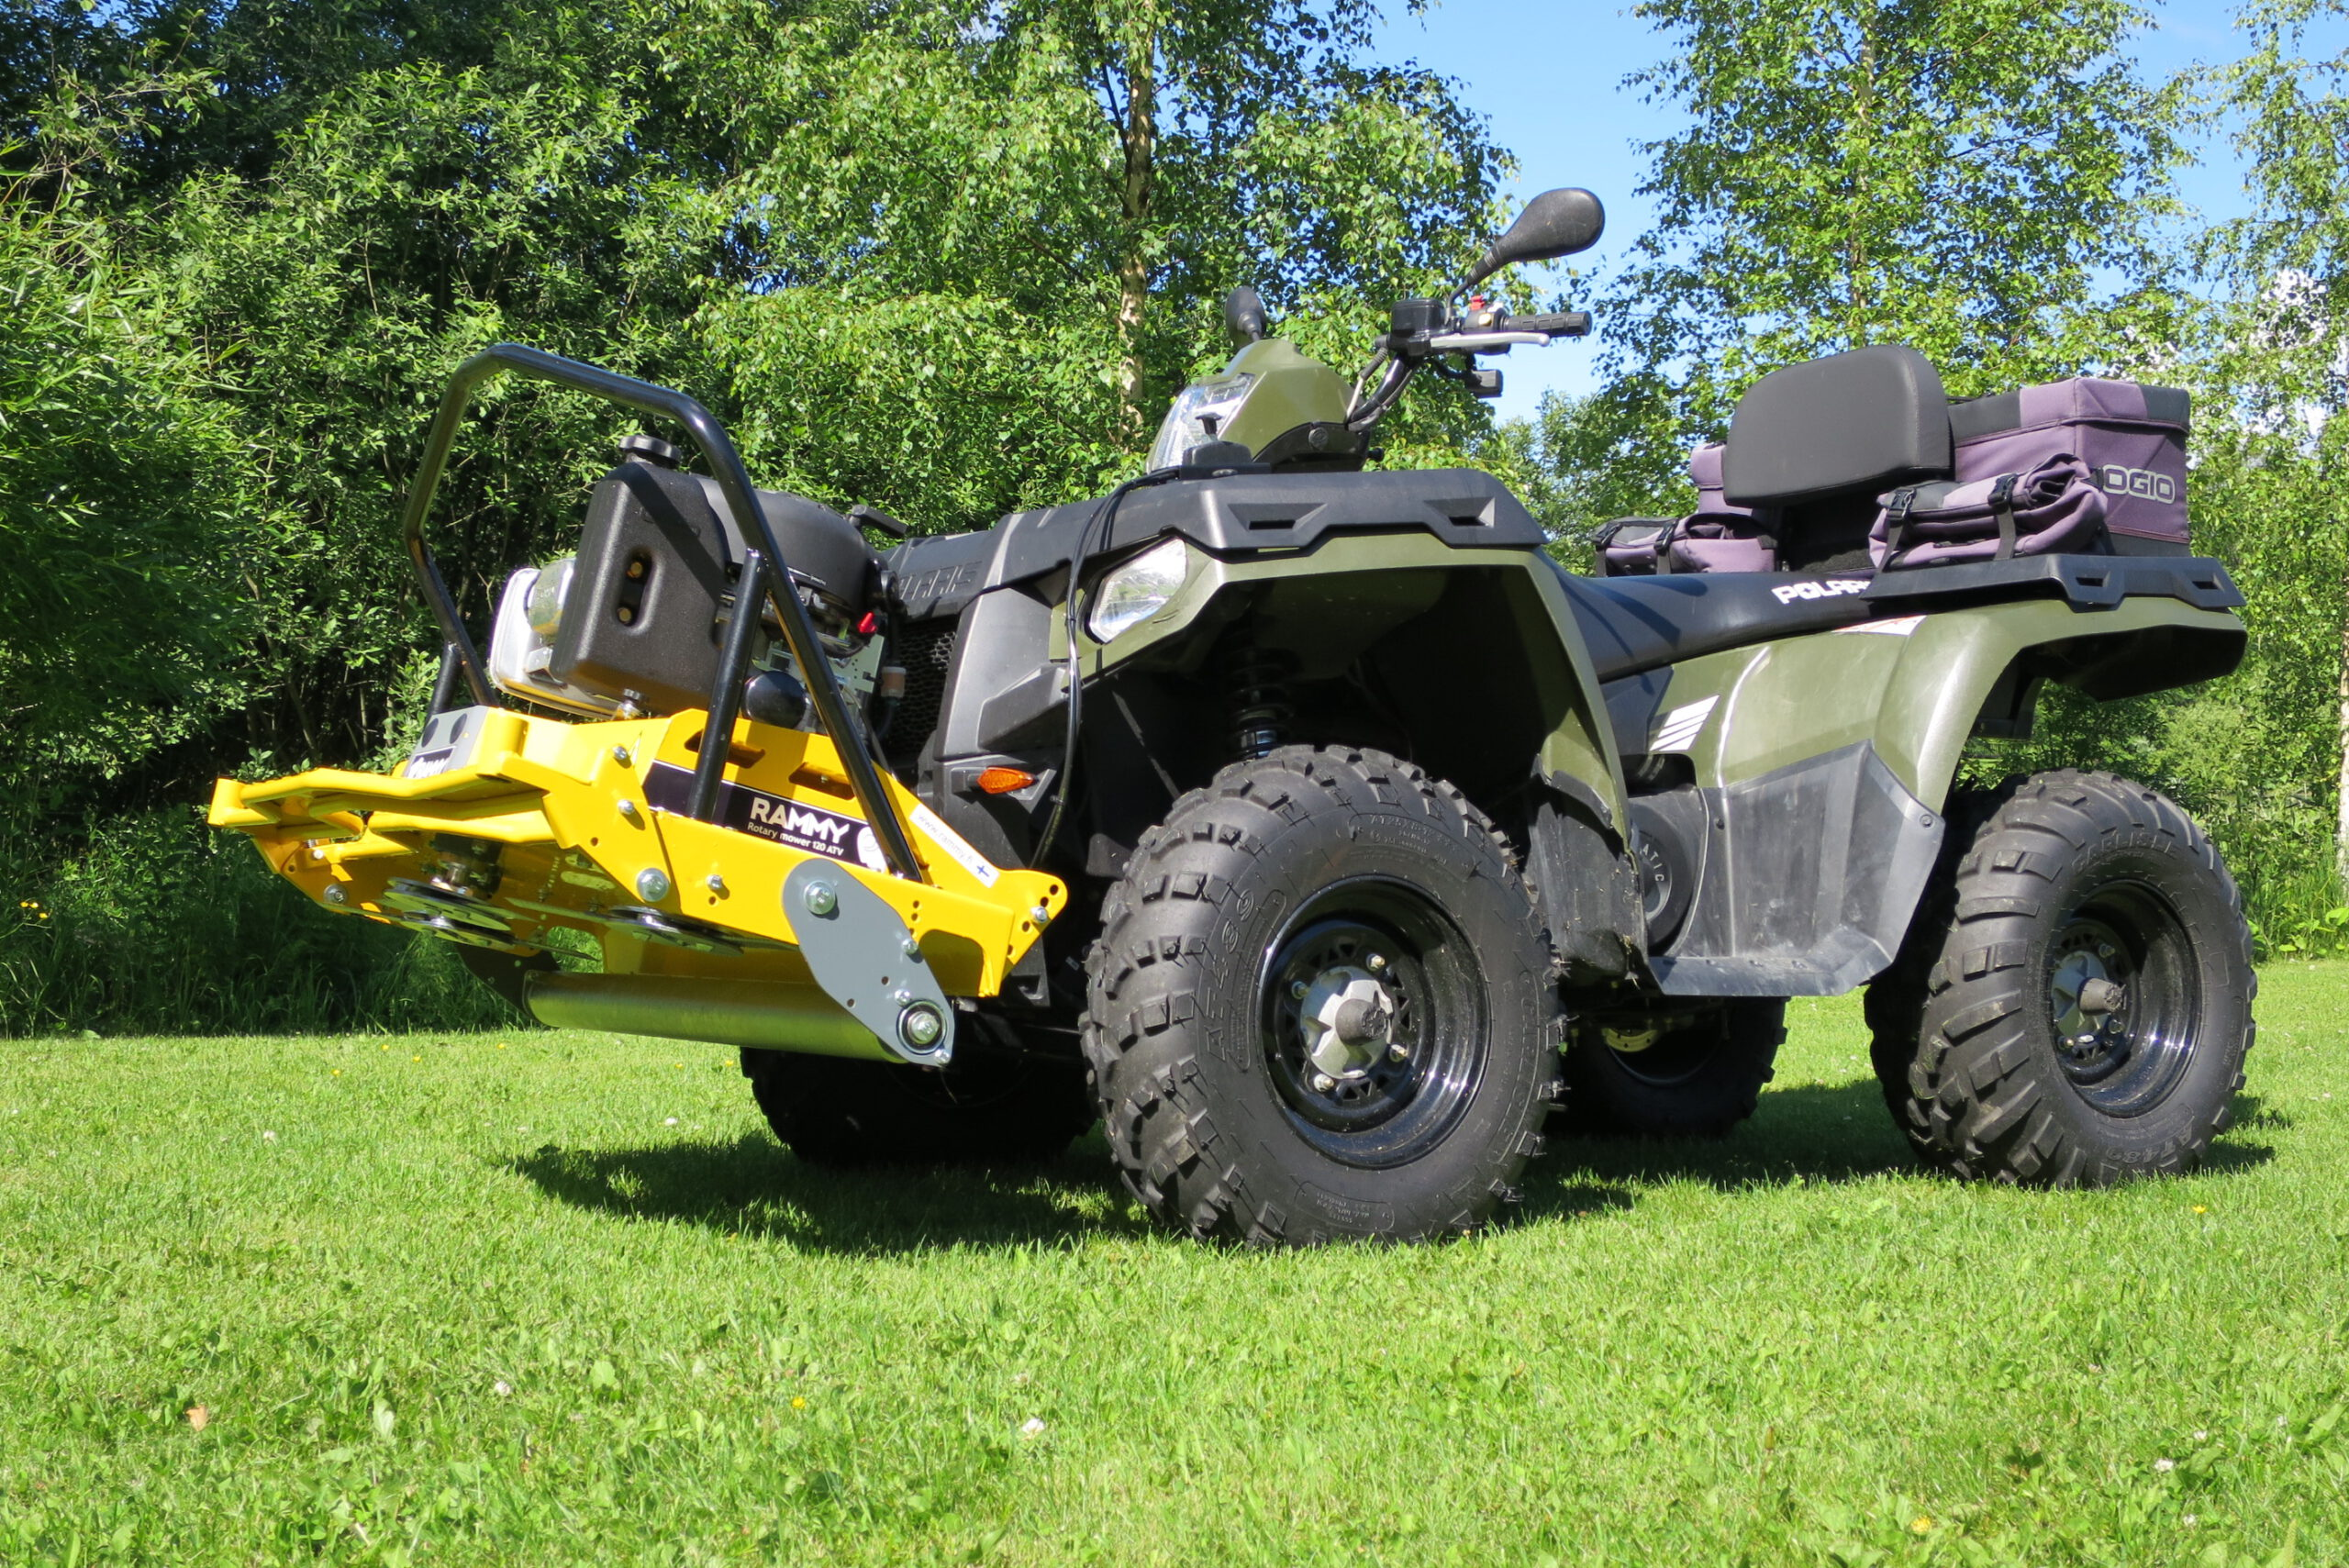 Rammy Rotary mower 120 ATV PRO (48)